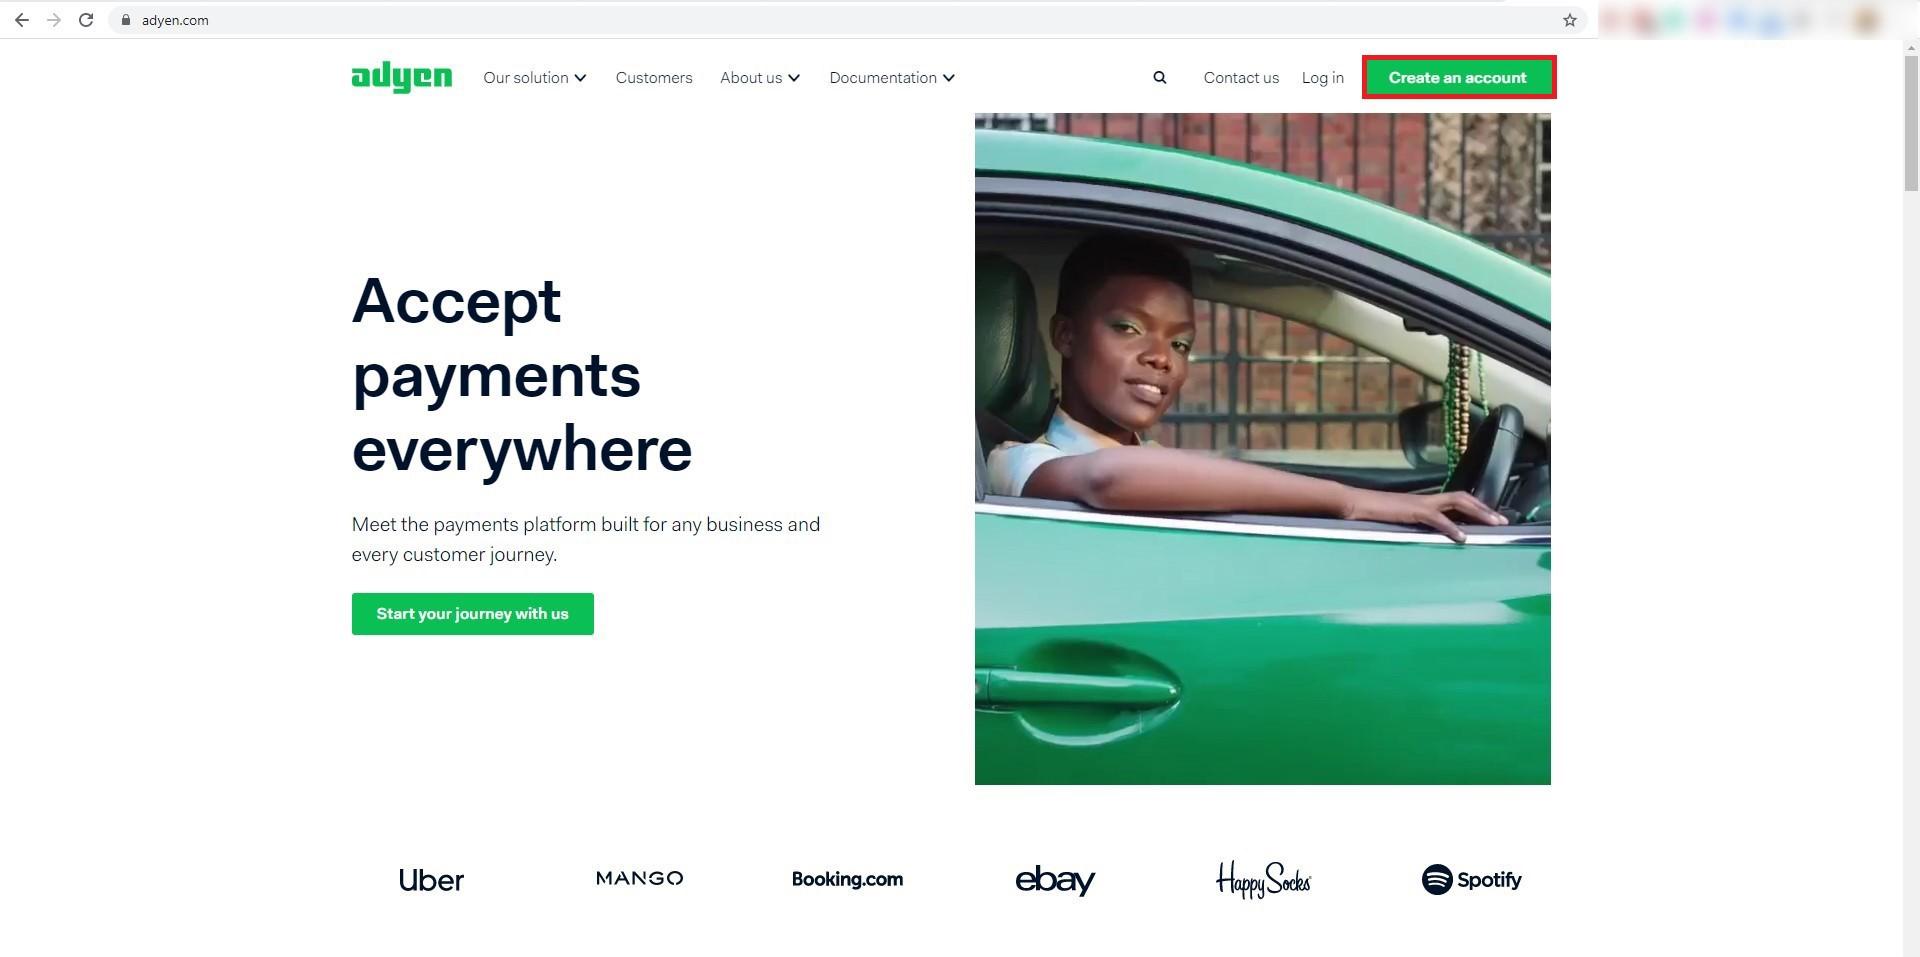 adyen-payment-gateway